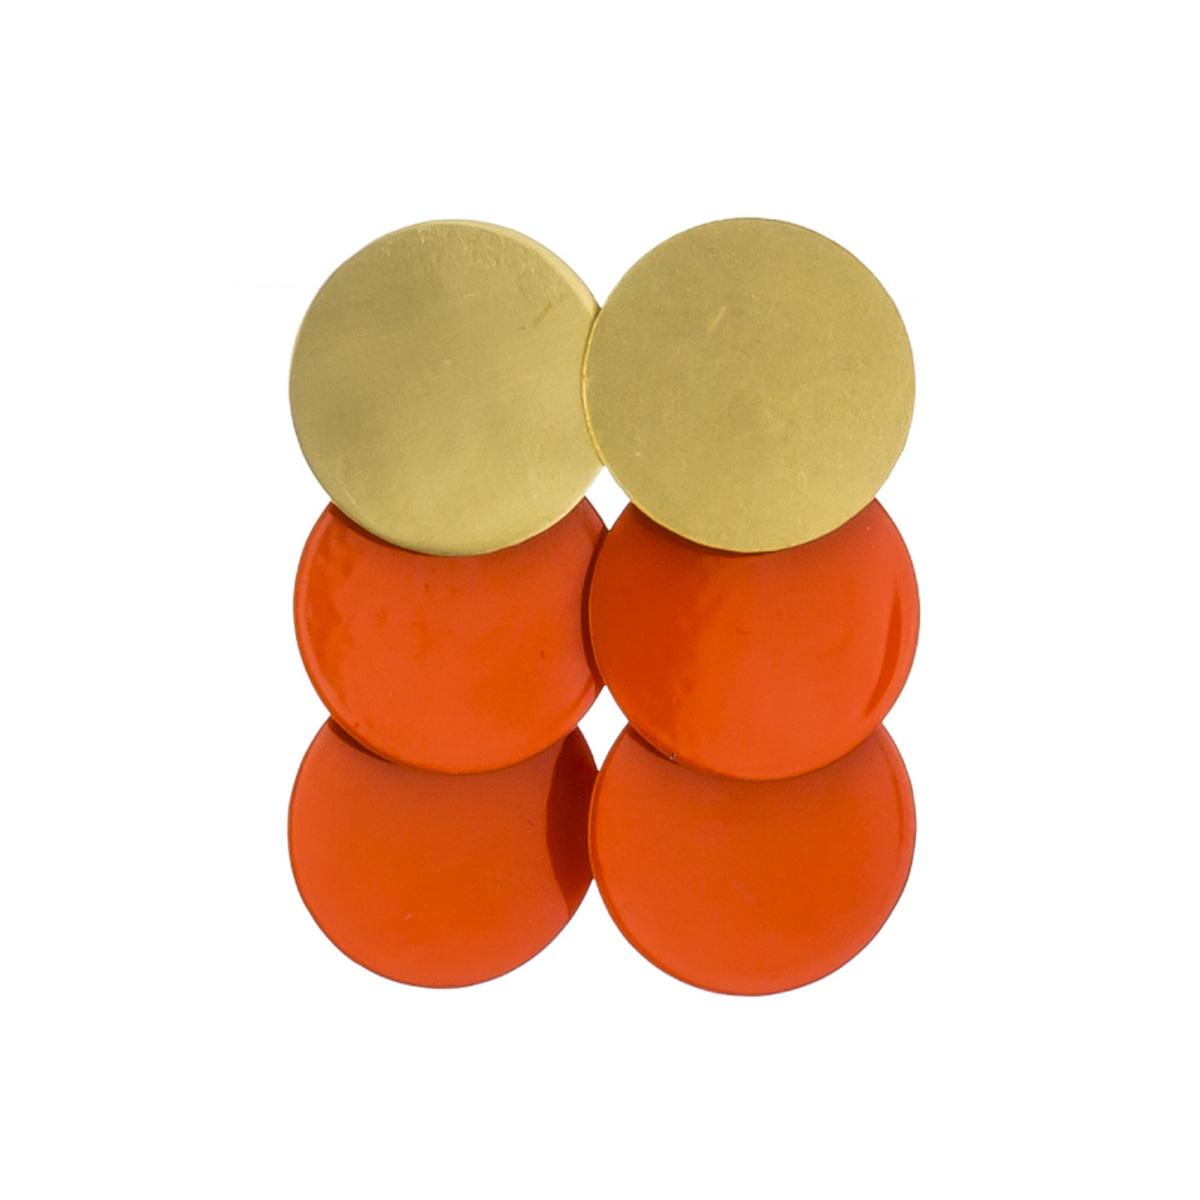 Papaya circles stud earrings by Sibilia